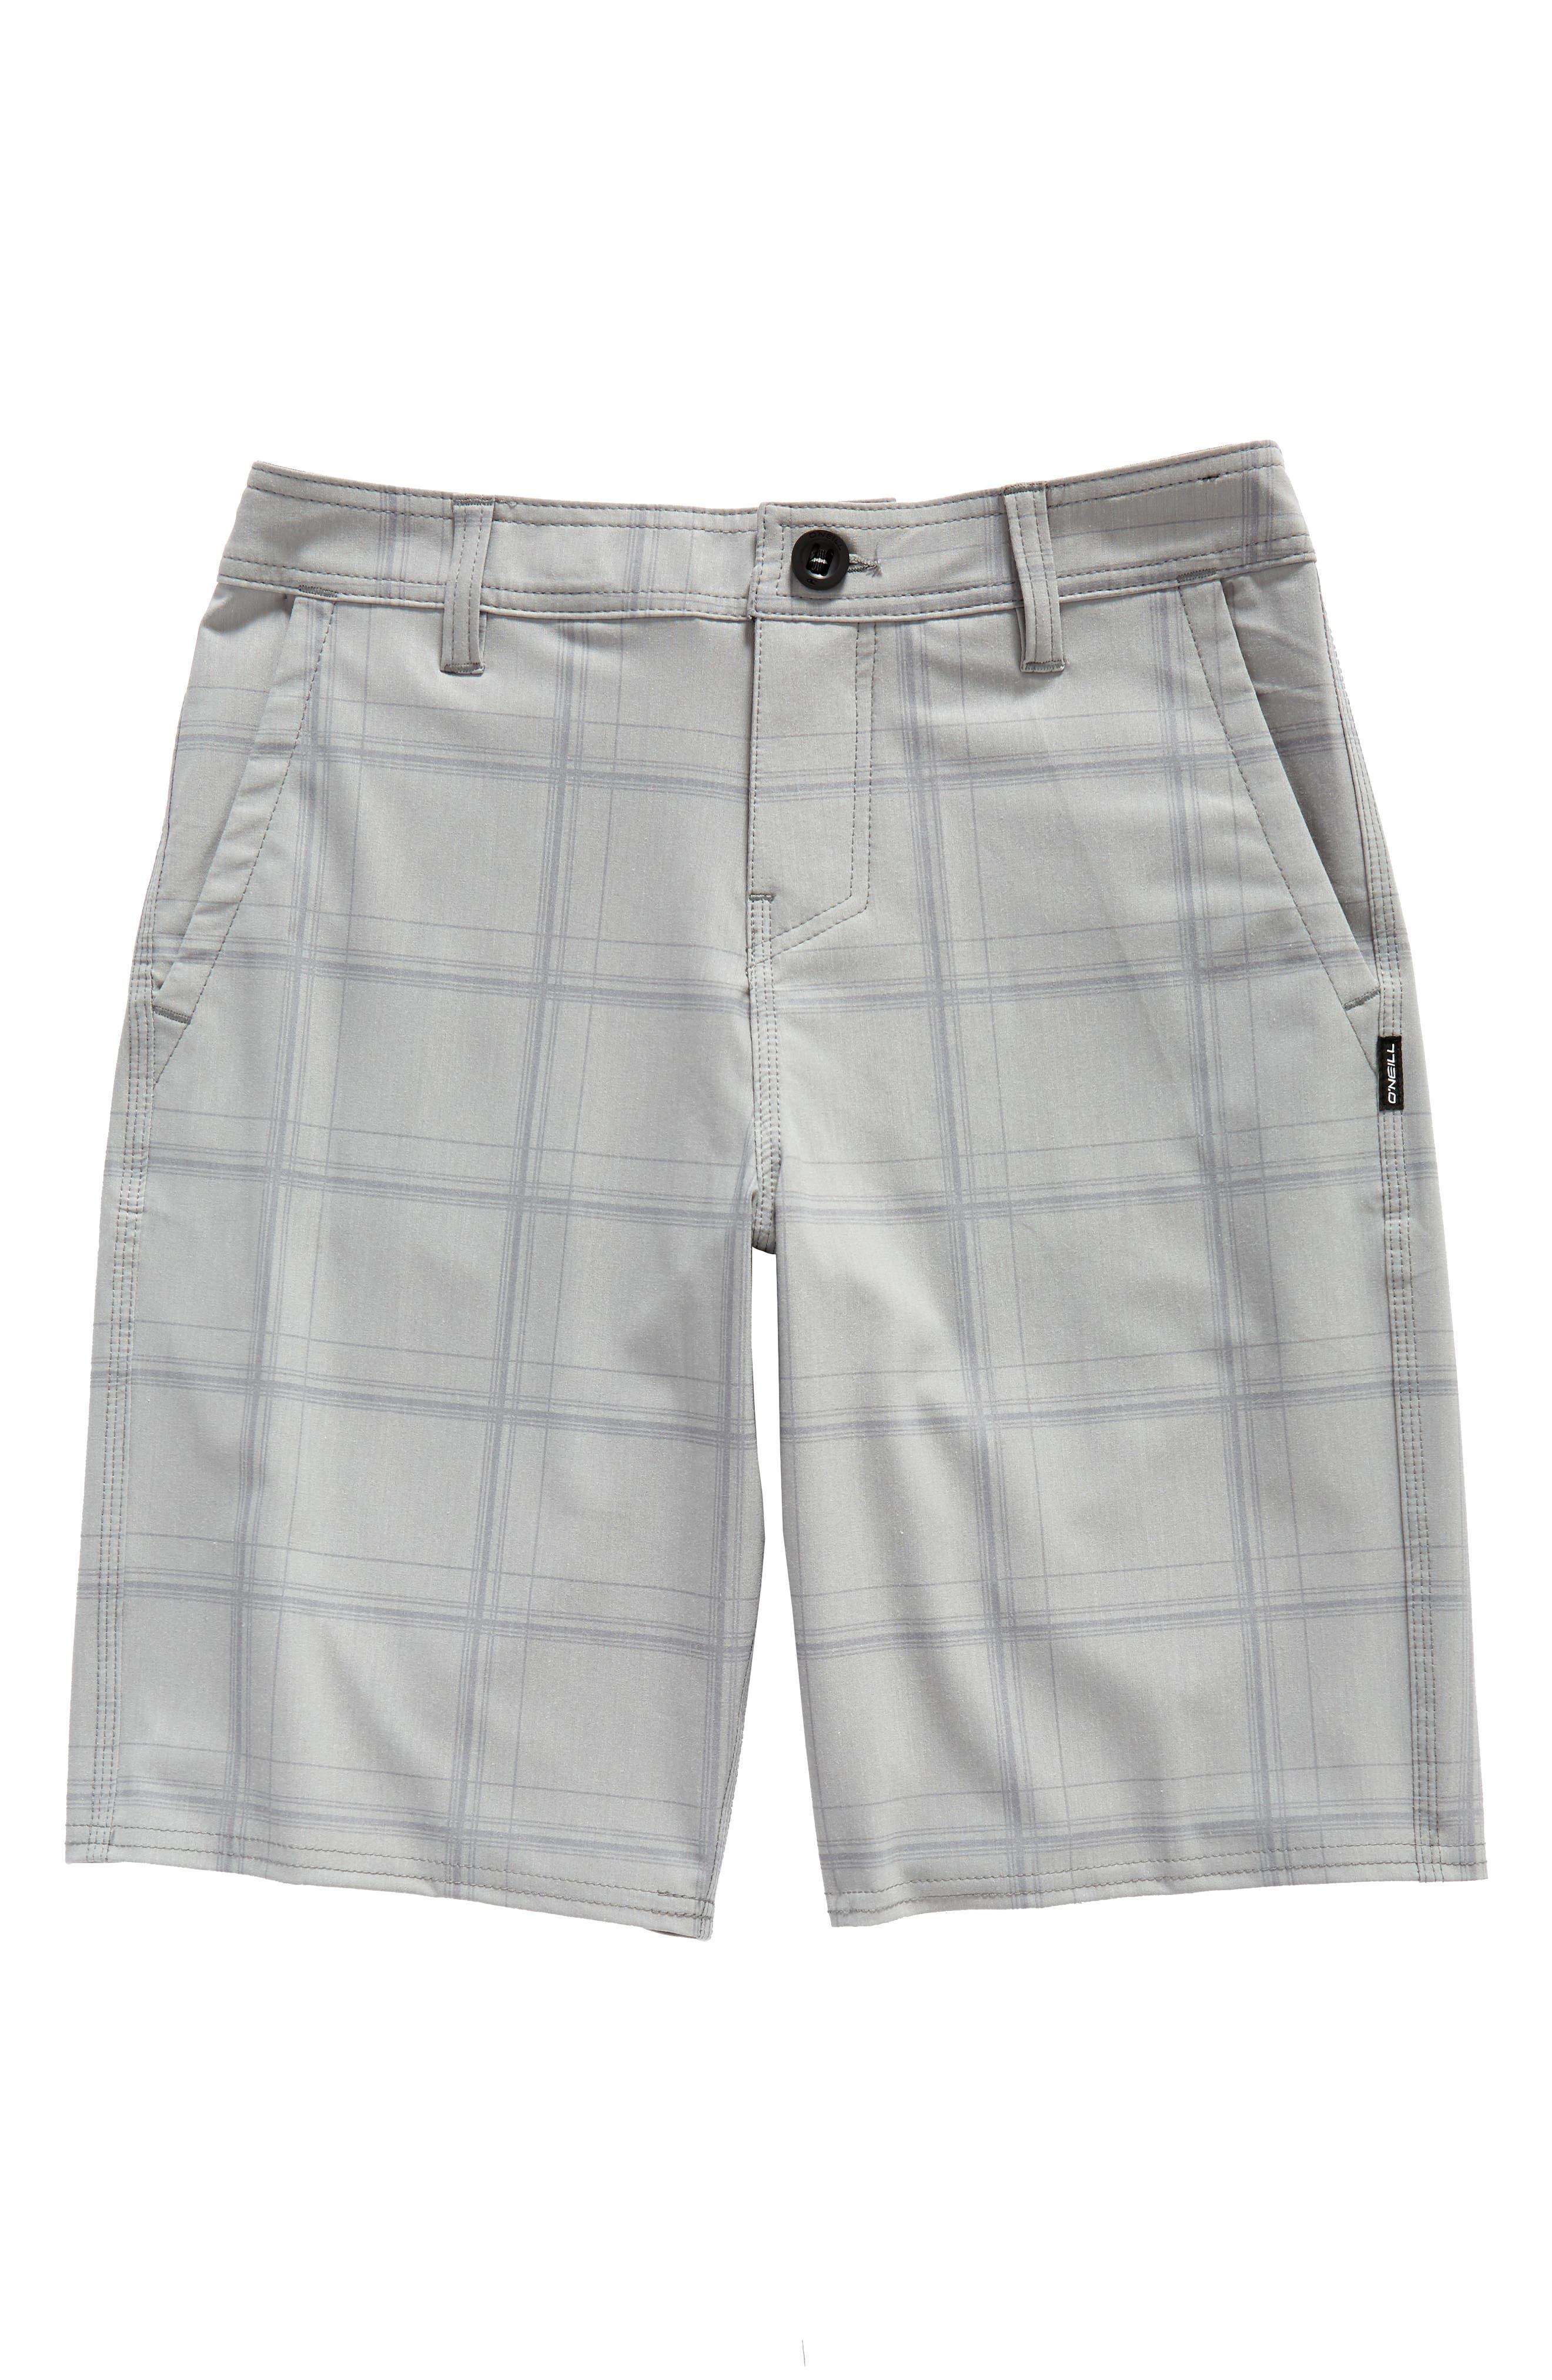 Alternate Image 1 Selected - O'Neill Mixed Hybrid Shorts (Big Boys)